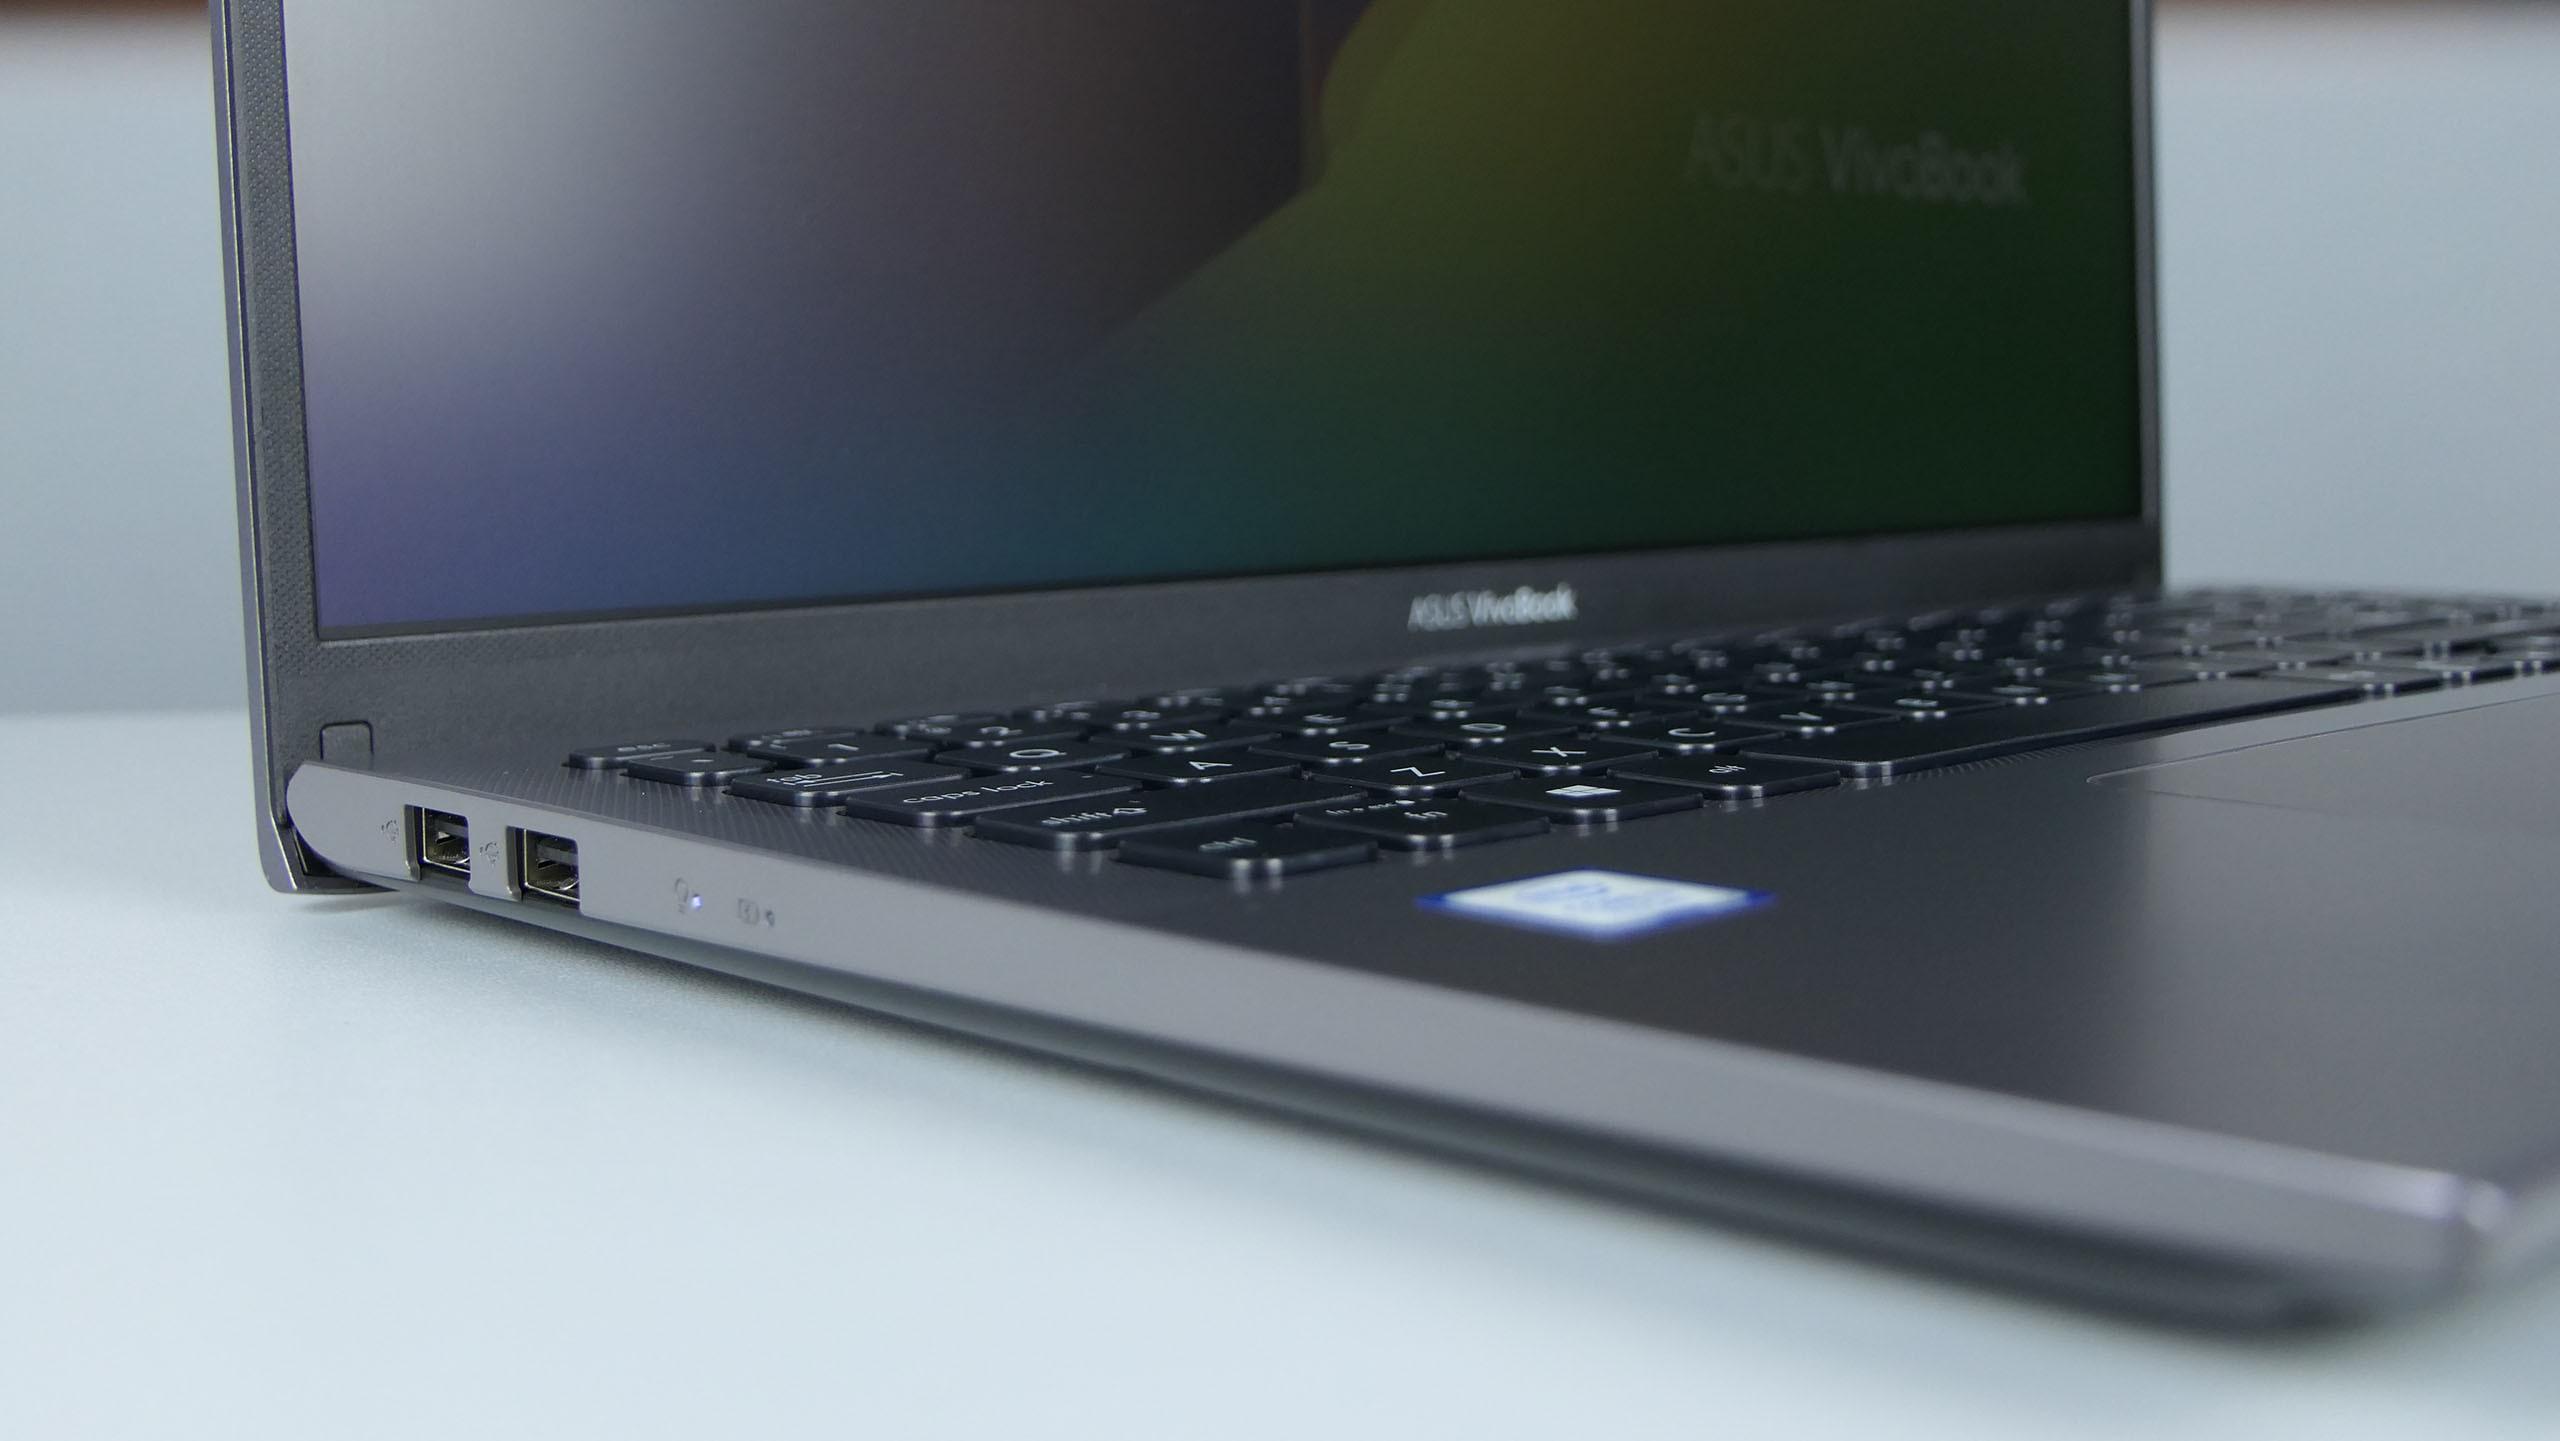 Asus VivoBook 15 X512UA / R564U - dwa USB 2.0